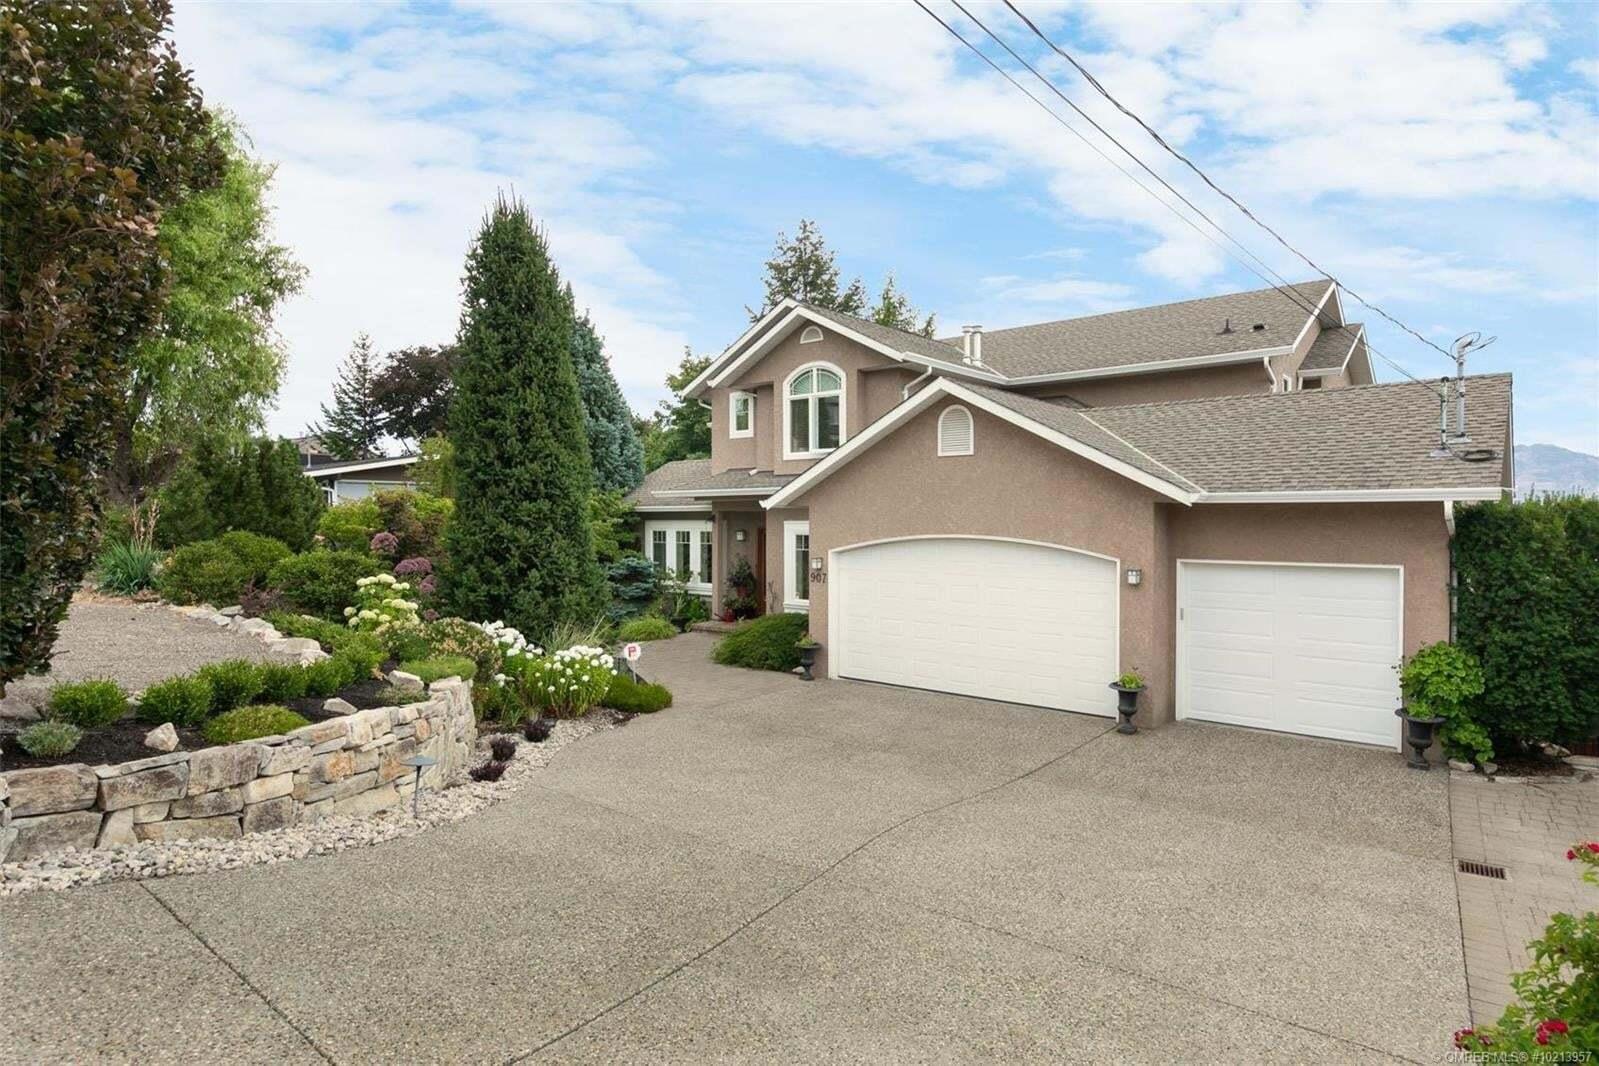 House for sale at 907 Stevenson Rd West Kelowna British Columbia - MLS: 10213957